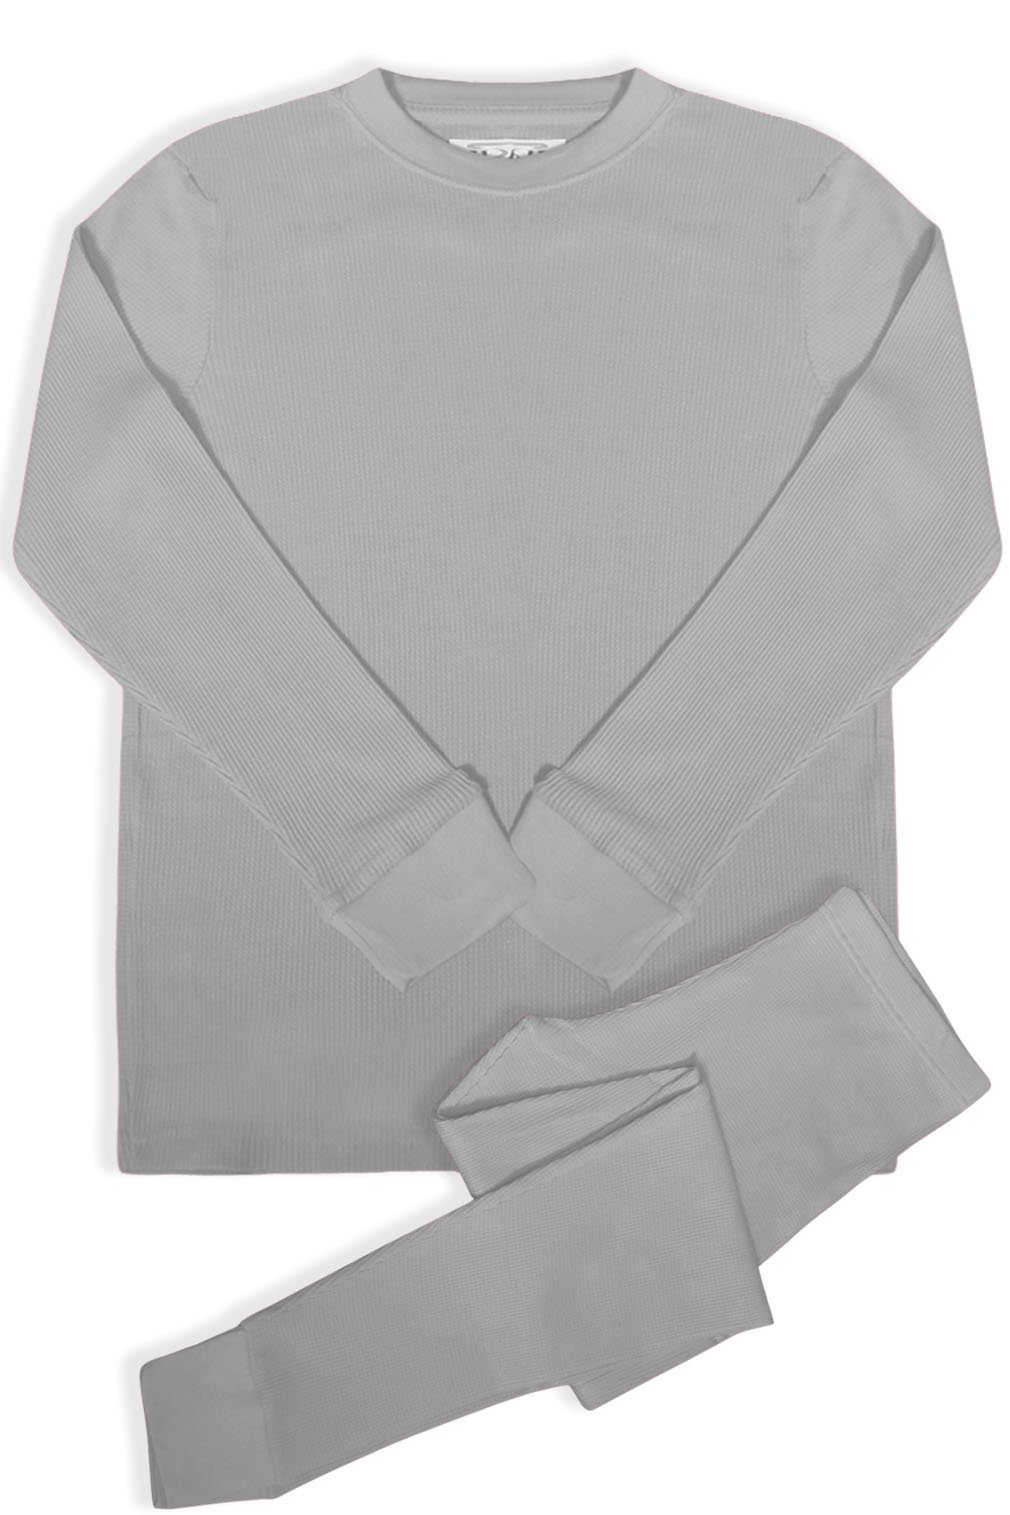 BASICO Women's 2pc Long John Thermal Underwear Set 100% Cotton (X-Large, Cotton Blend Heather Grey)